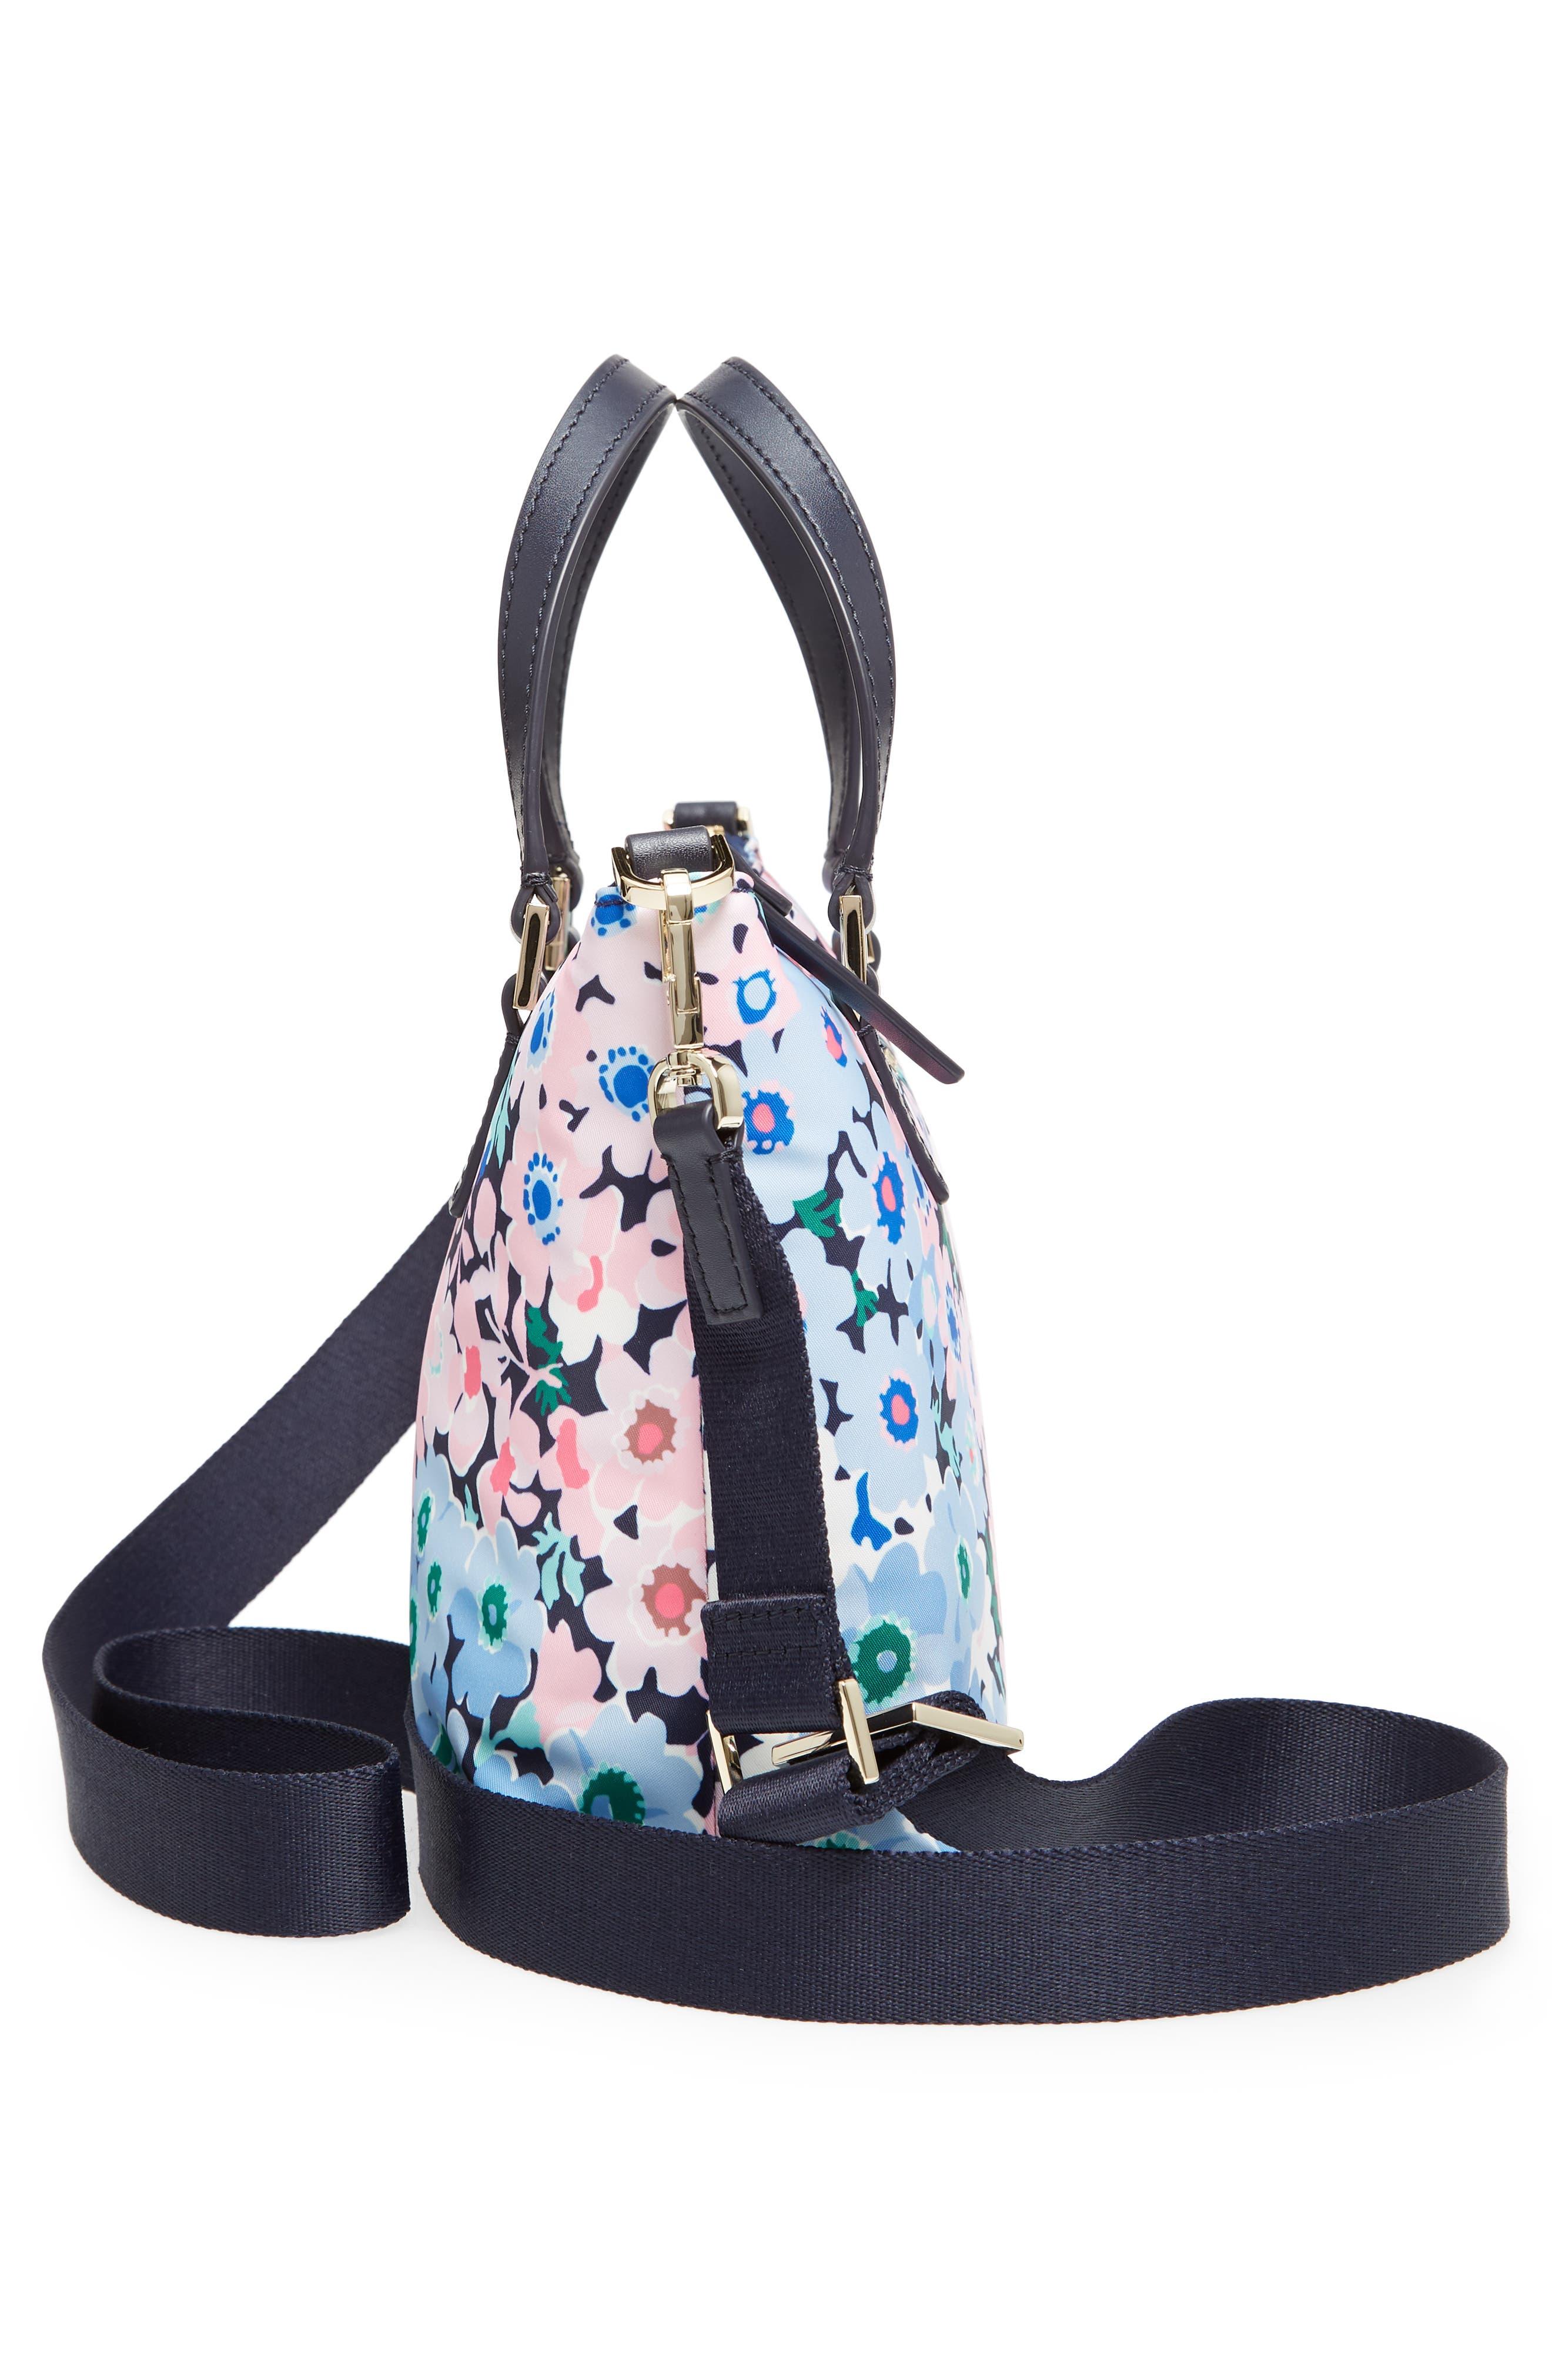 watson lane - daisy garden lucie crossbody bag,                             Alternate thumbnail 5, color,                             Blue Multi